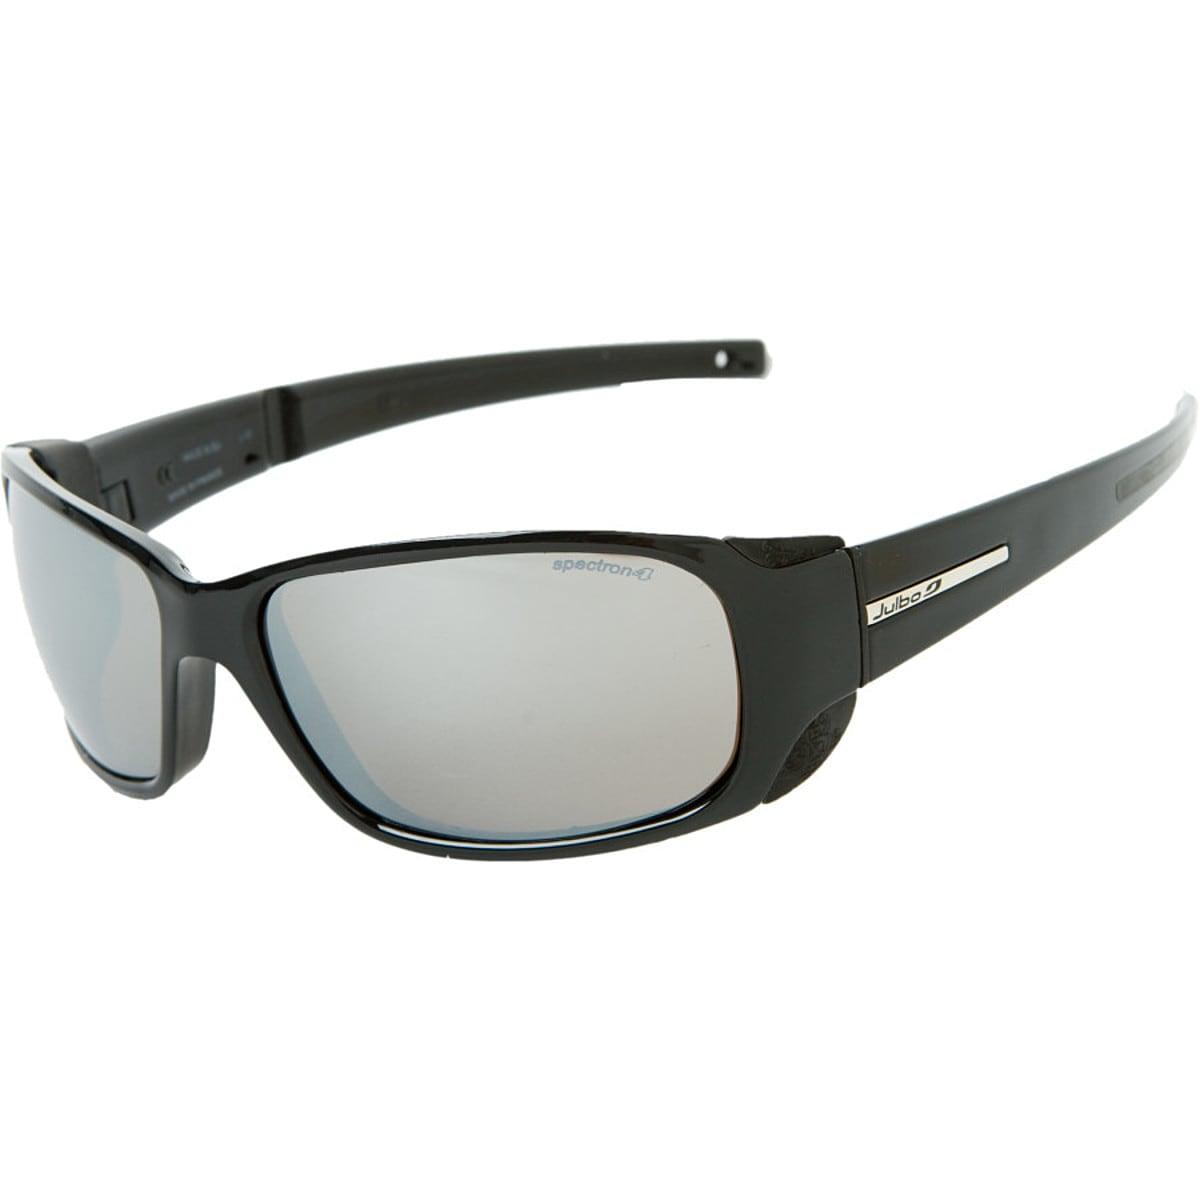 Spectron 4 Black//Red Julbo Montebianco Sunglasses